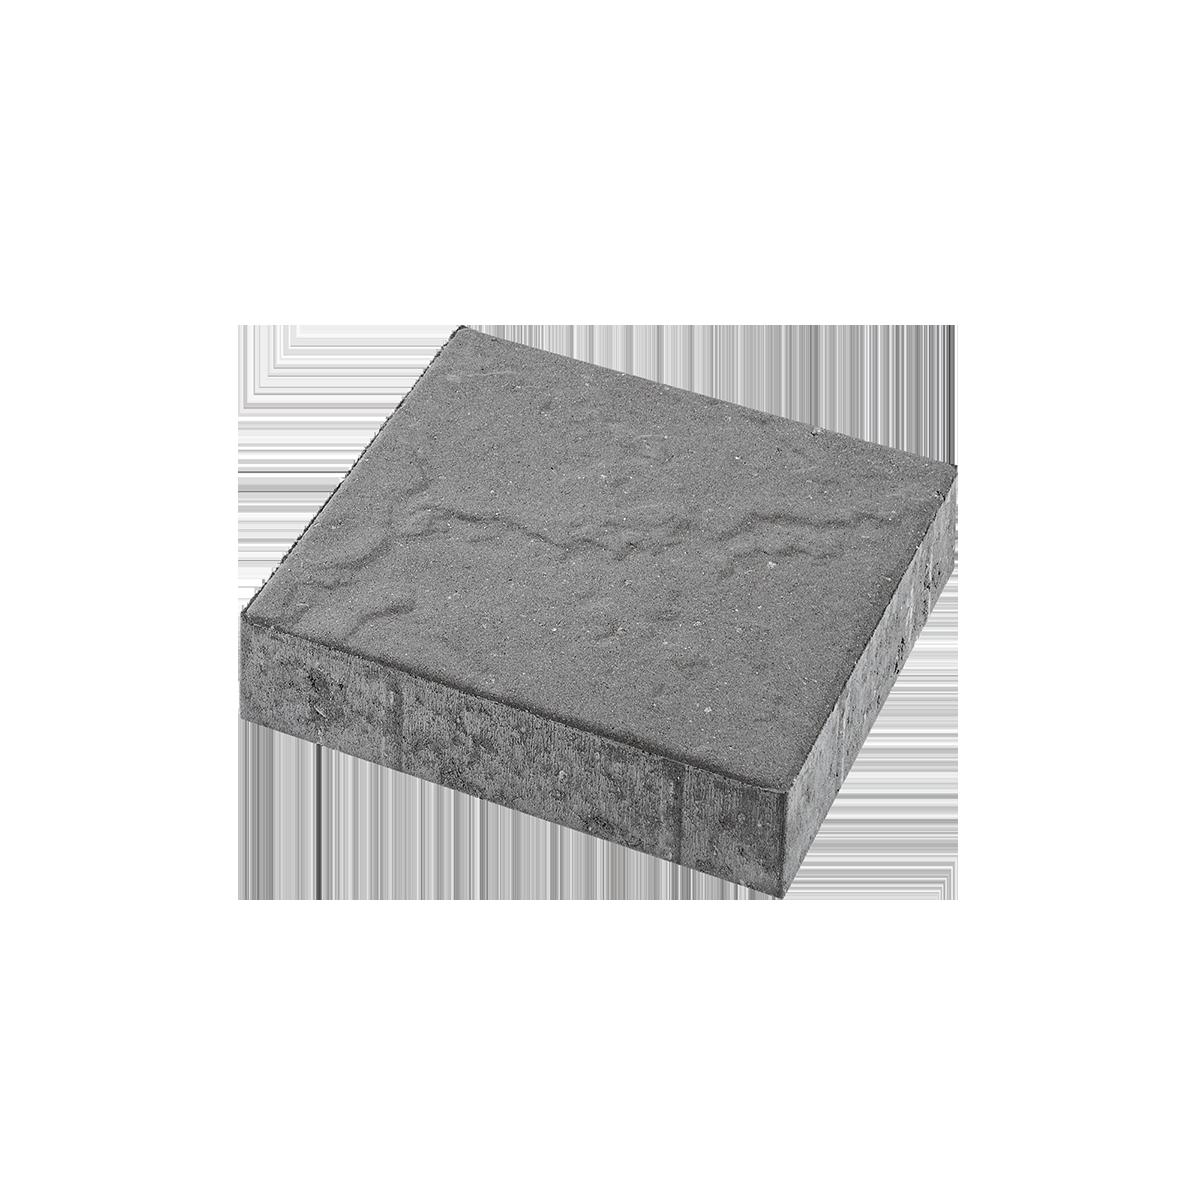 Skiferpræg 30x30x6 cm Grå